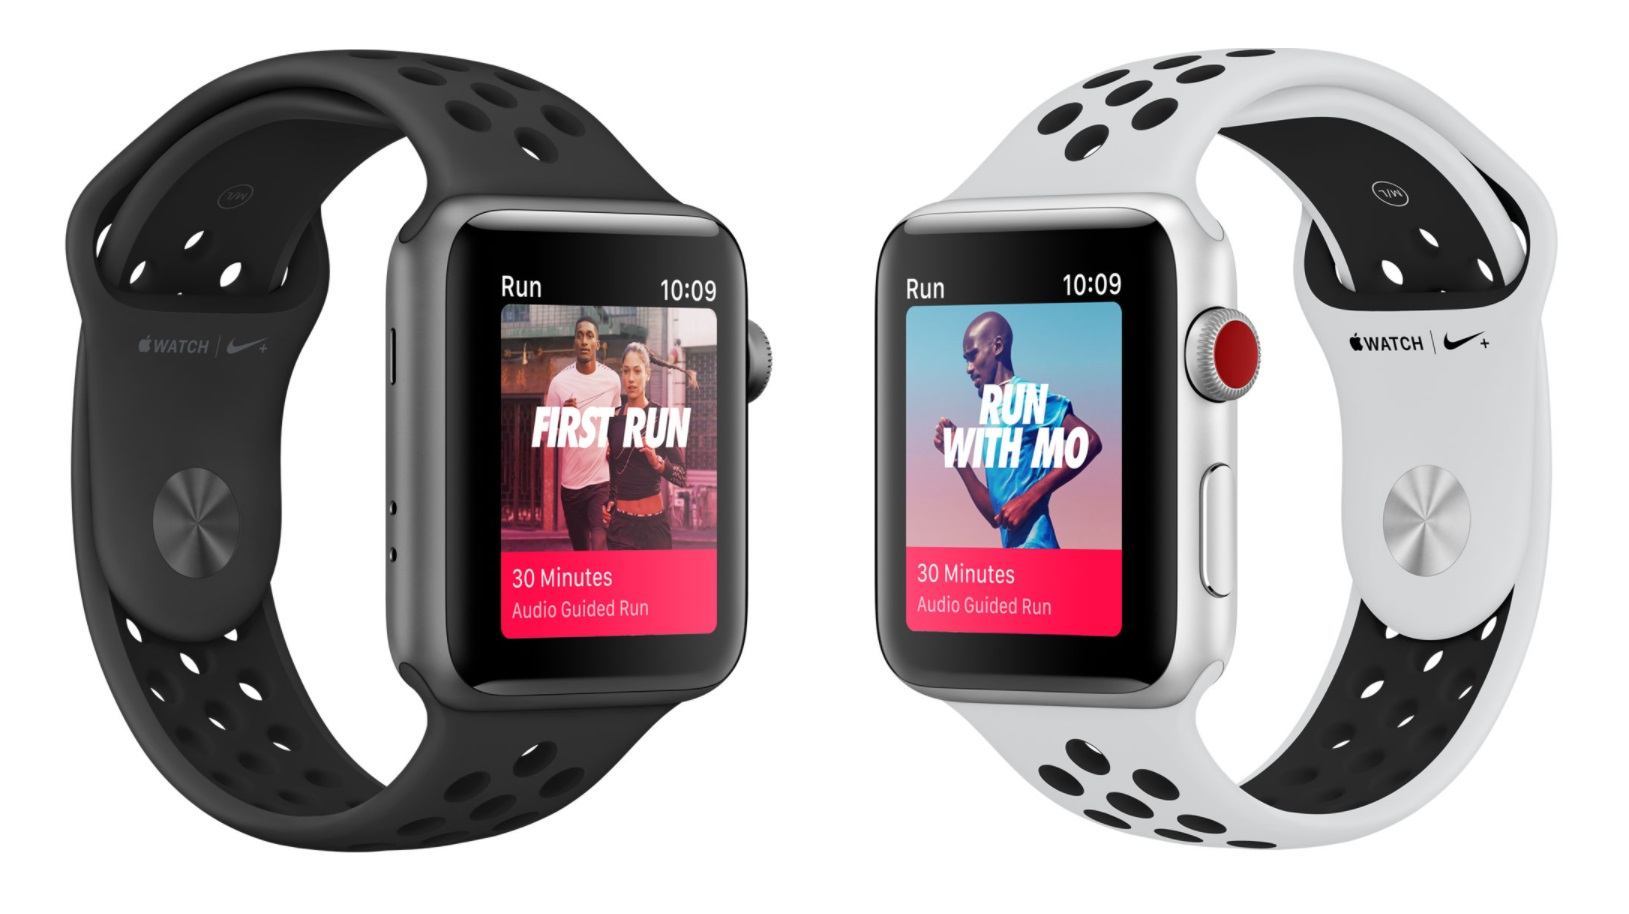 Apple Watch series 3 Nike+ Edition